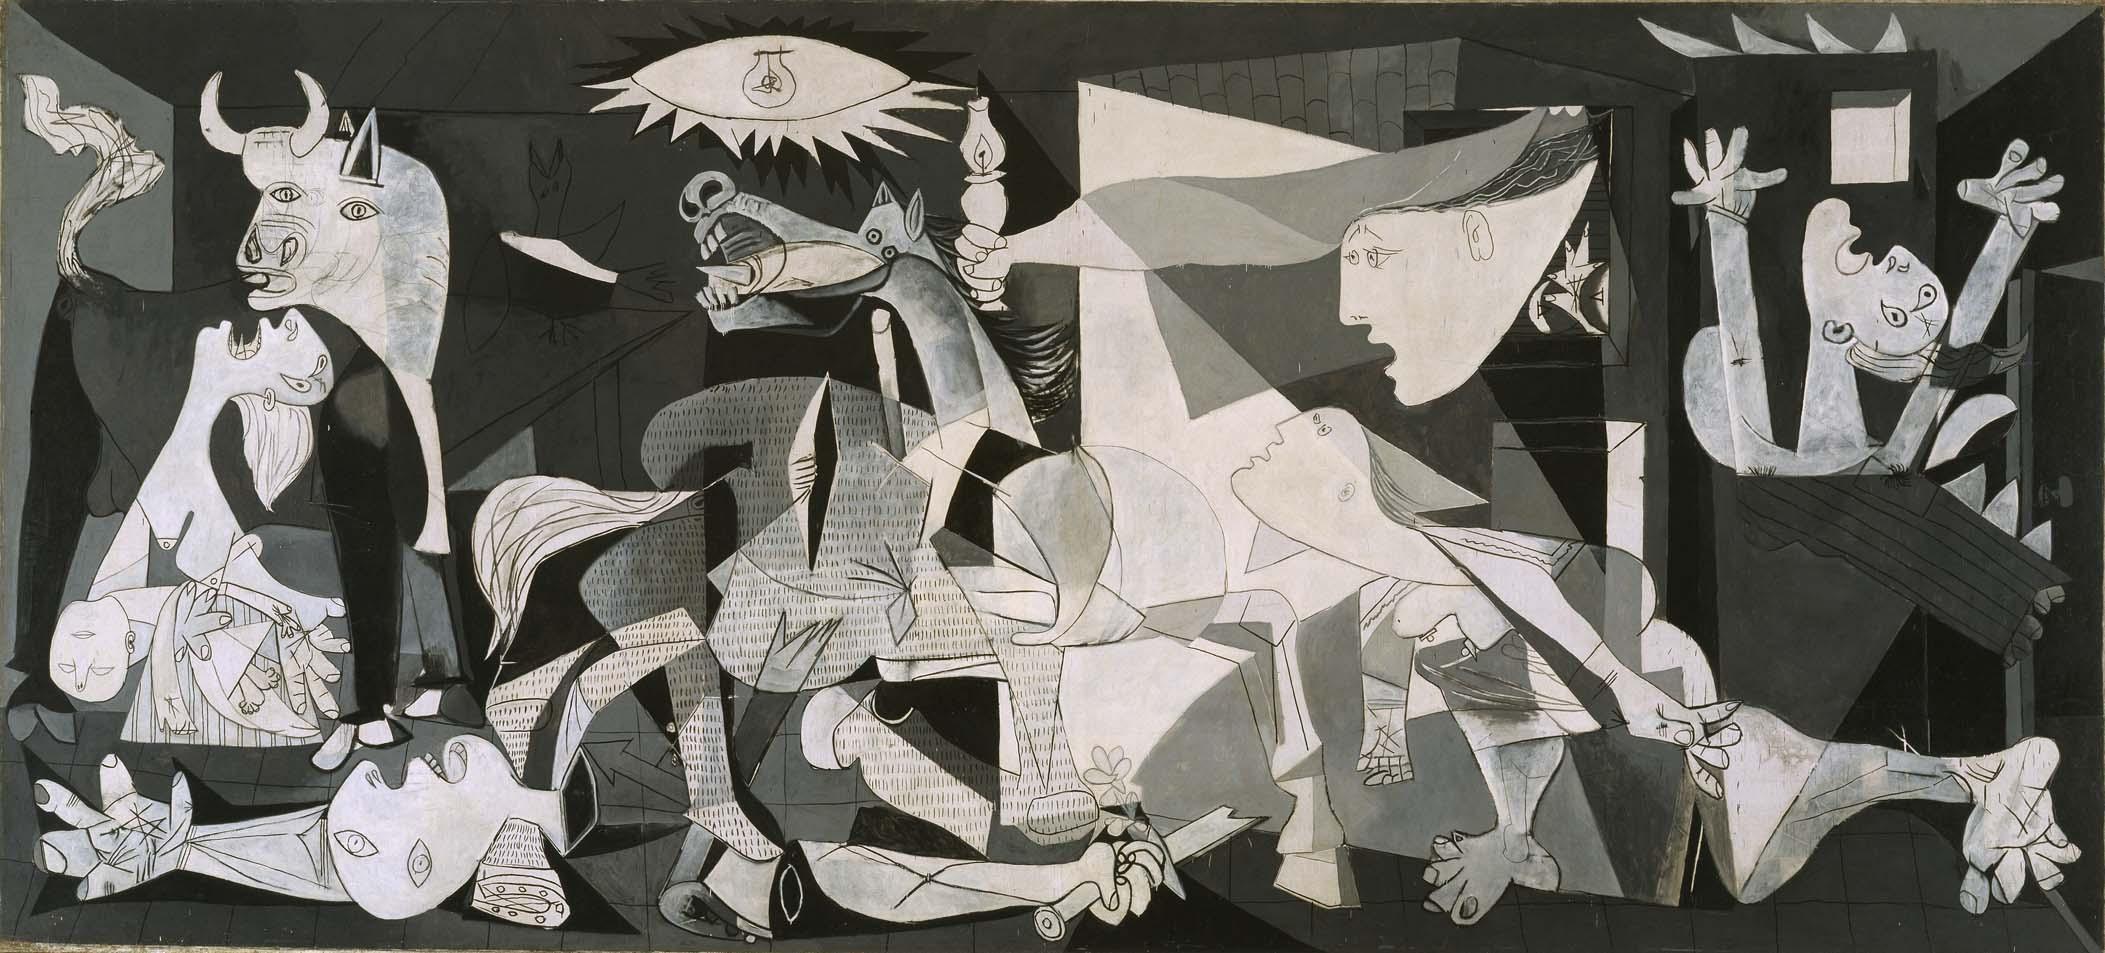 Pablo Picasso (Pablo Ruiz Picasso) - Guernica